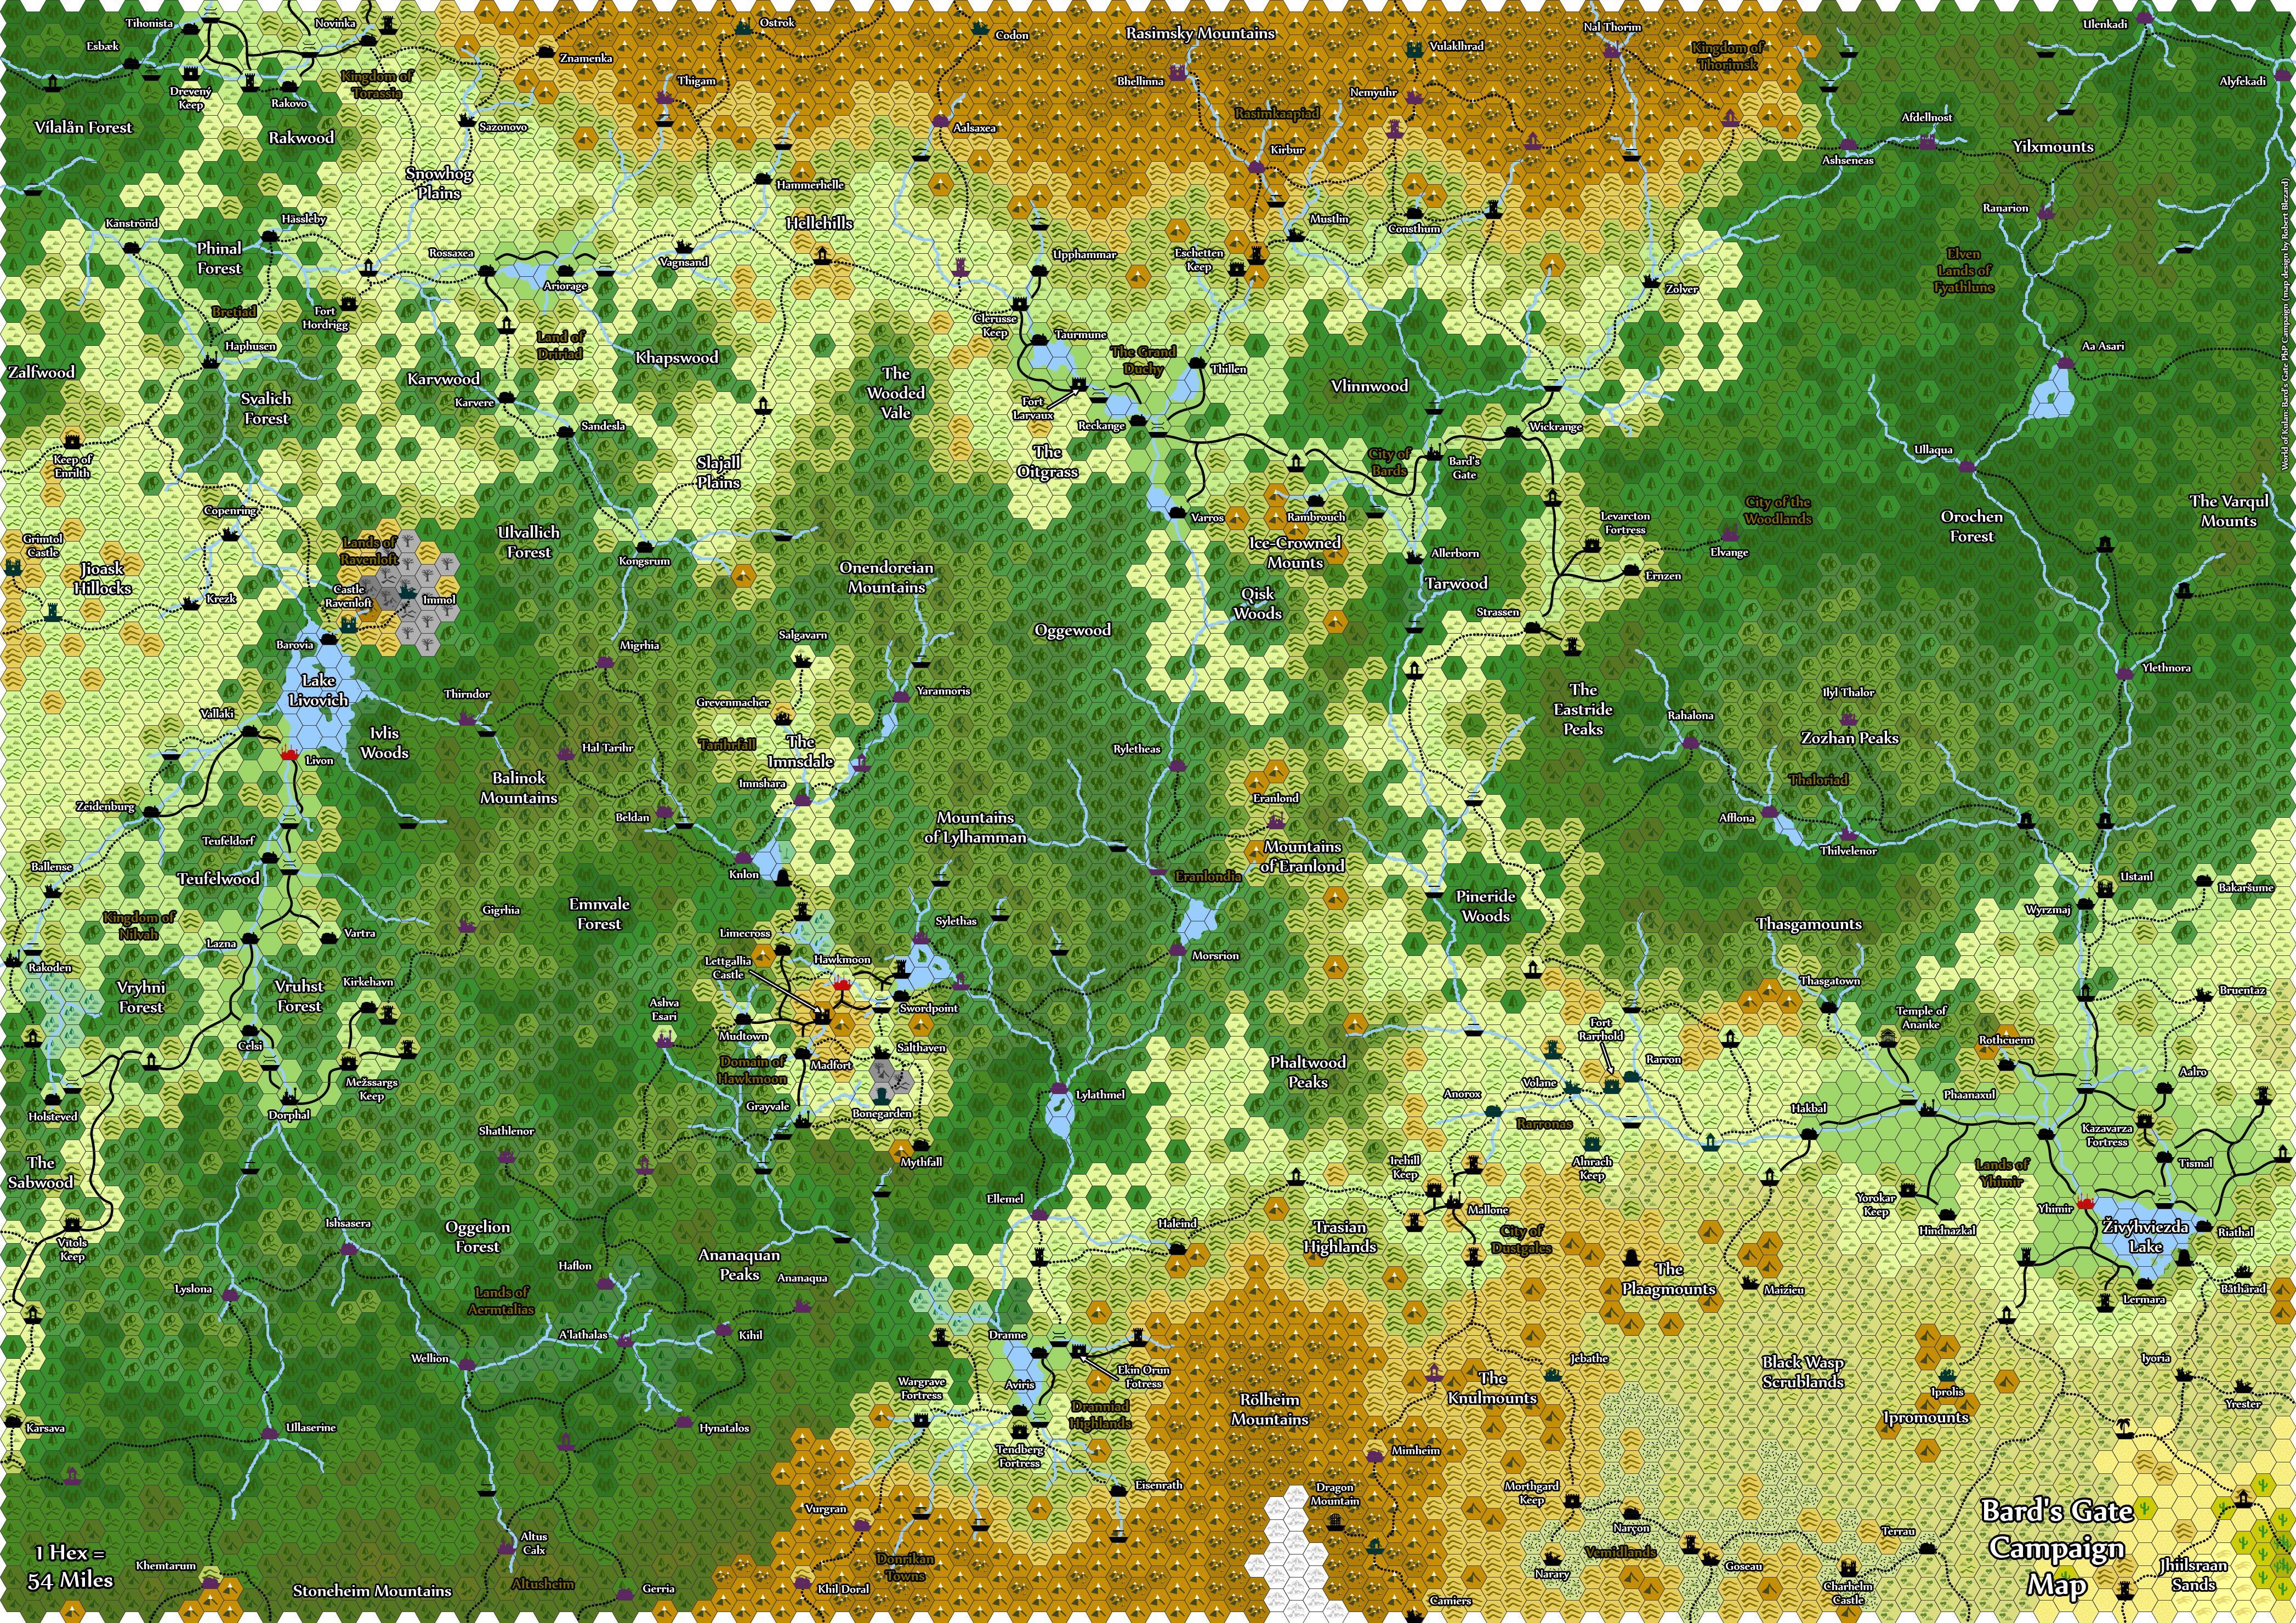 Bard's Gate Campaign Map.jpg